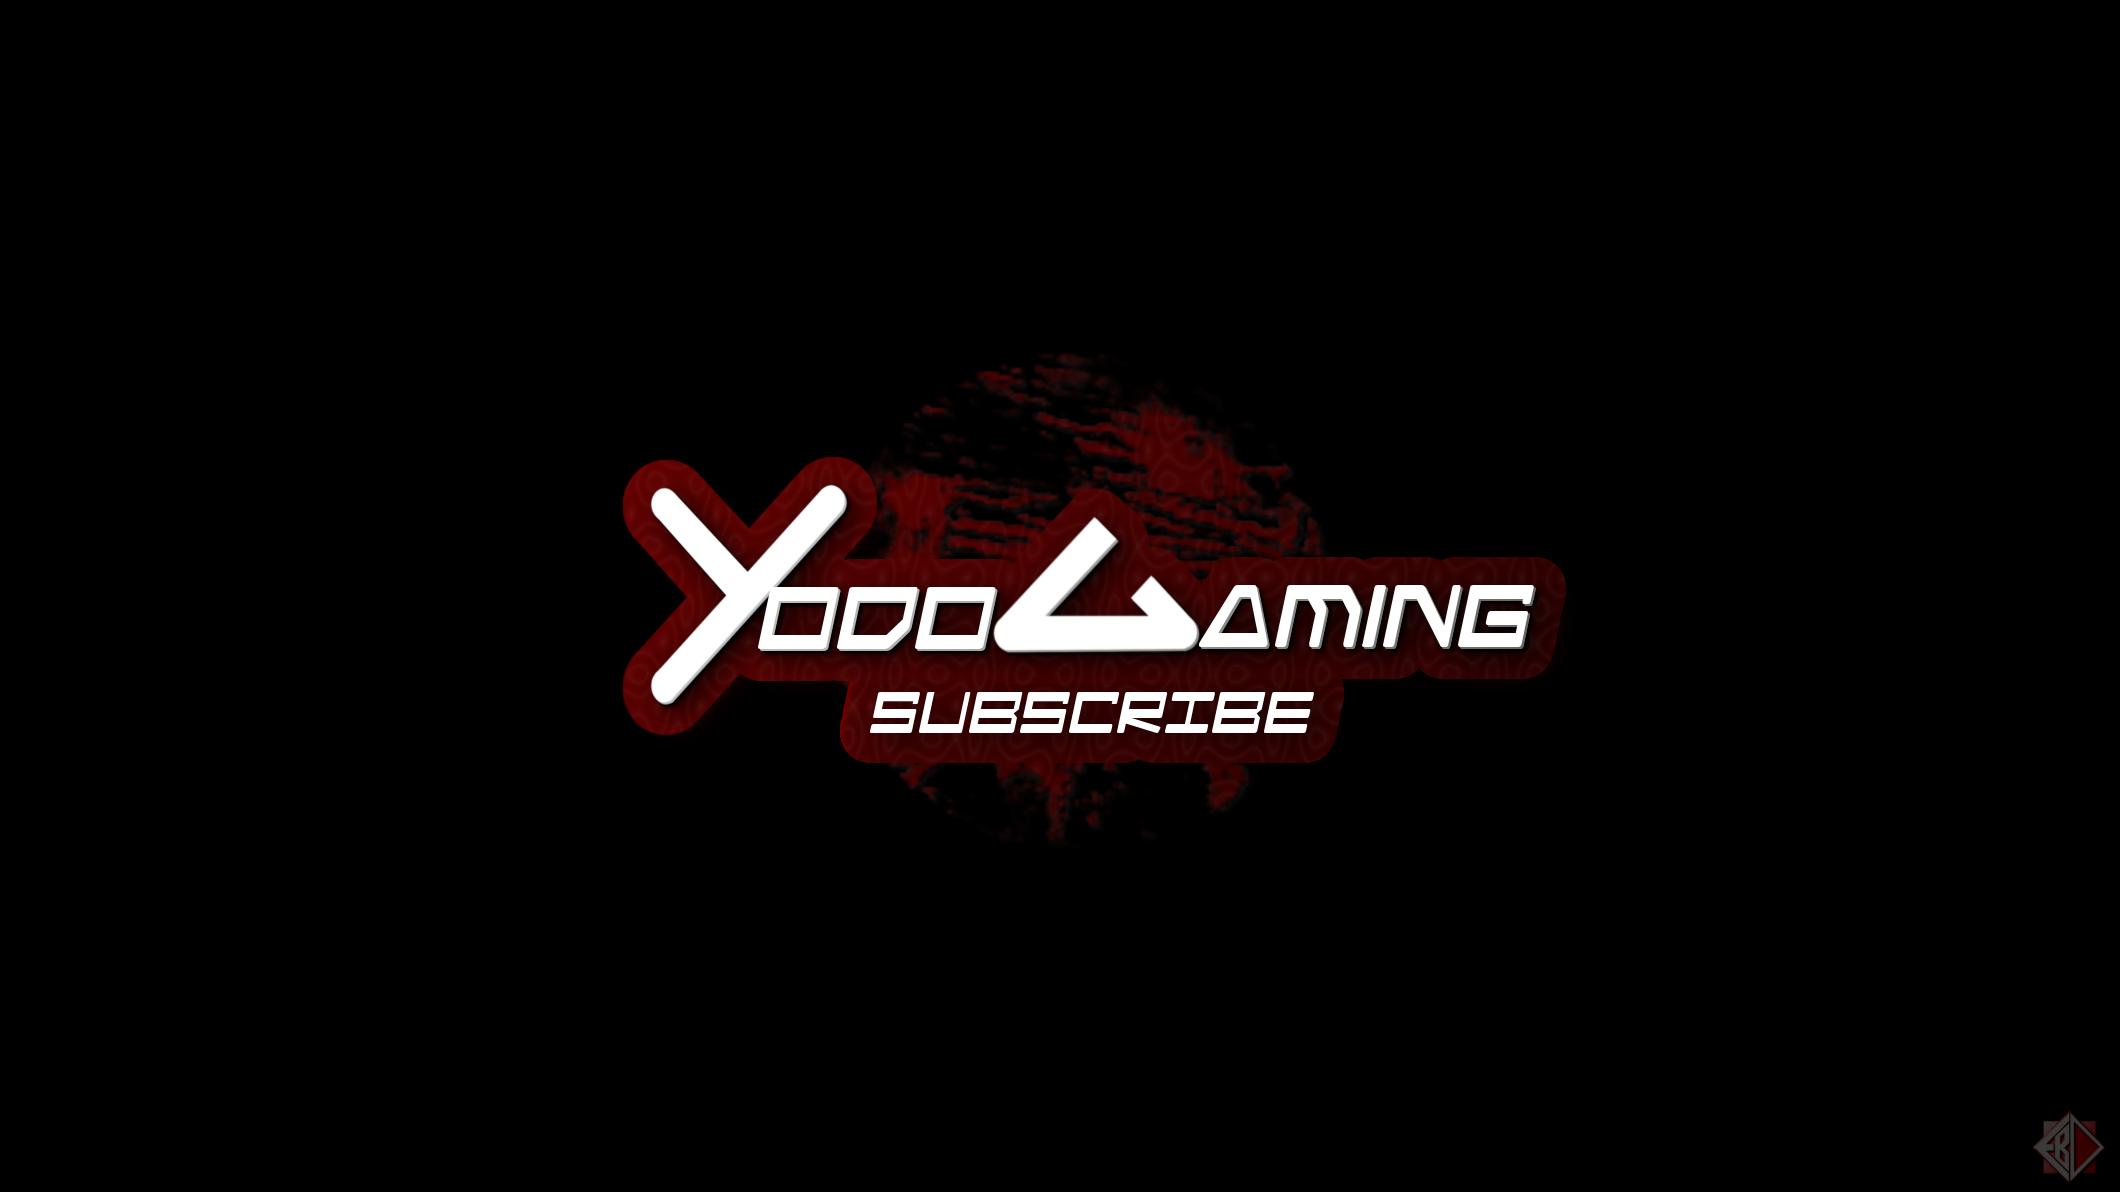 Yodo Gaming - Custom Channel Art by EverBadDesigns on DeviantArt